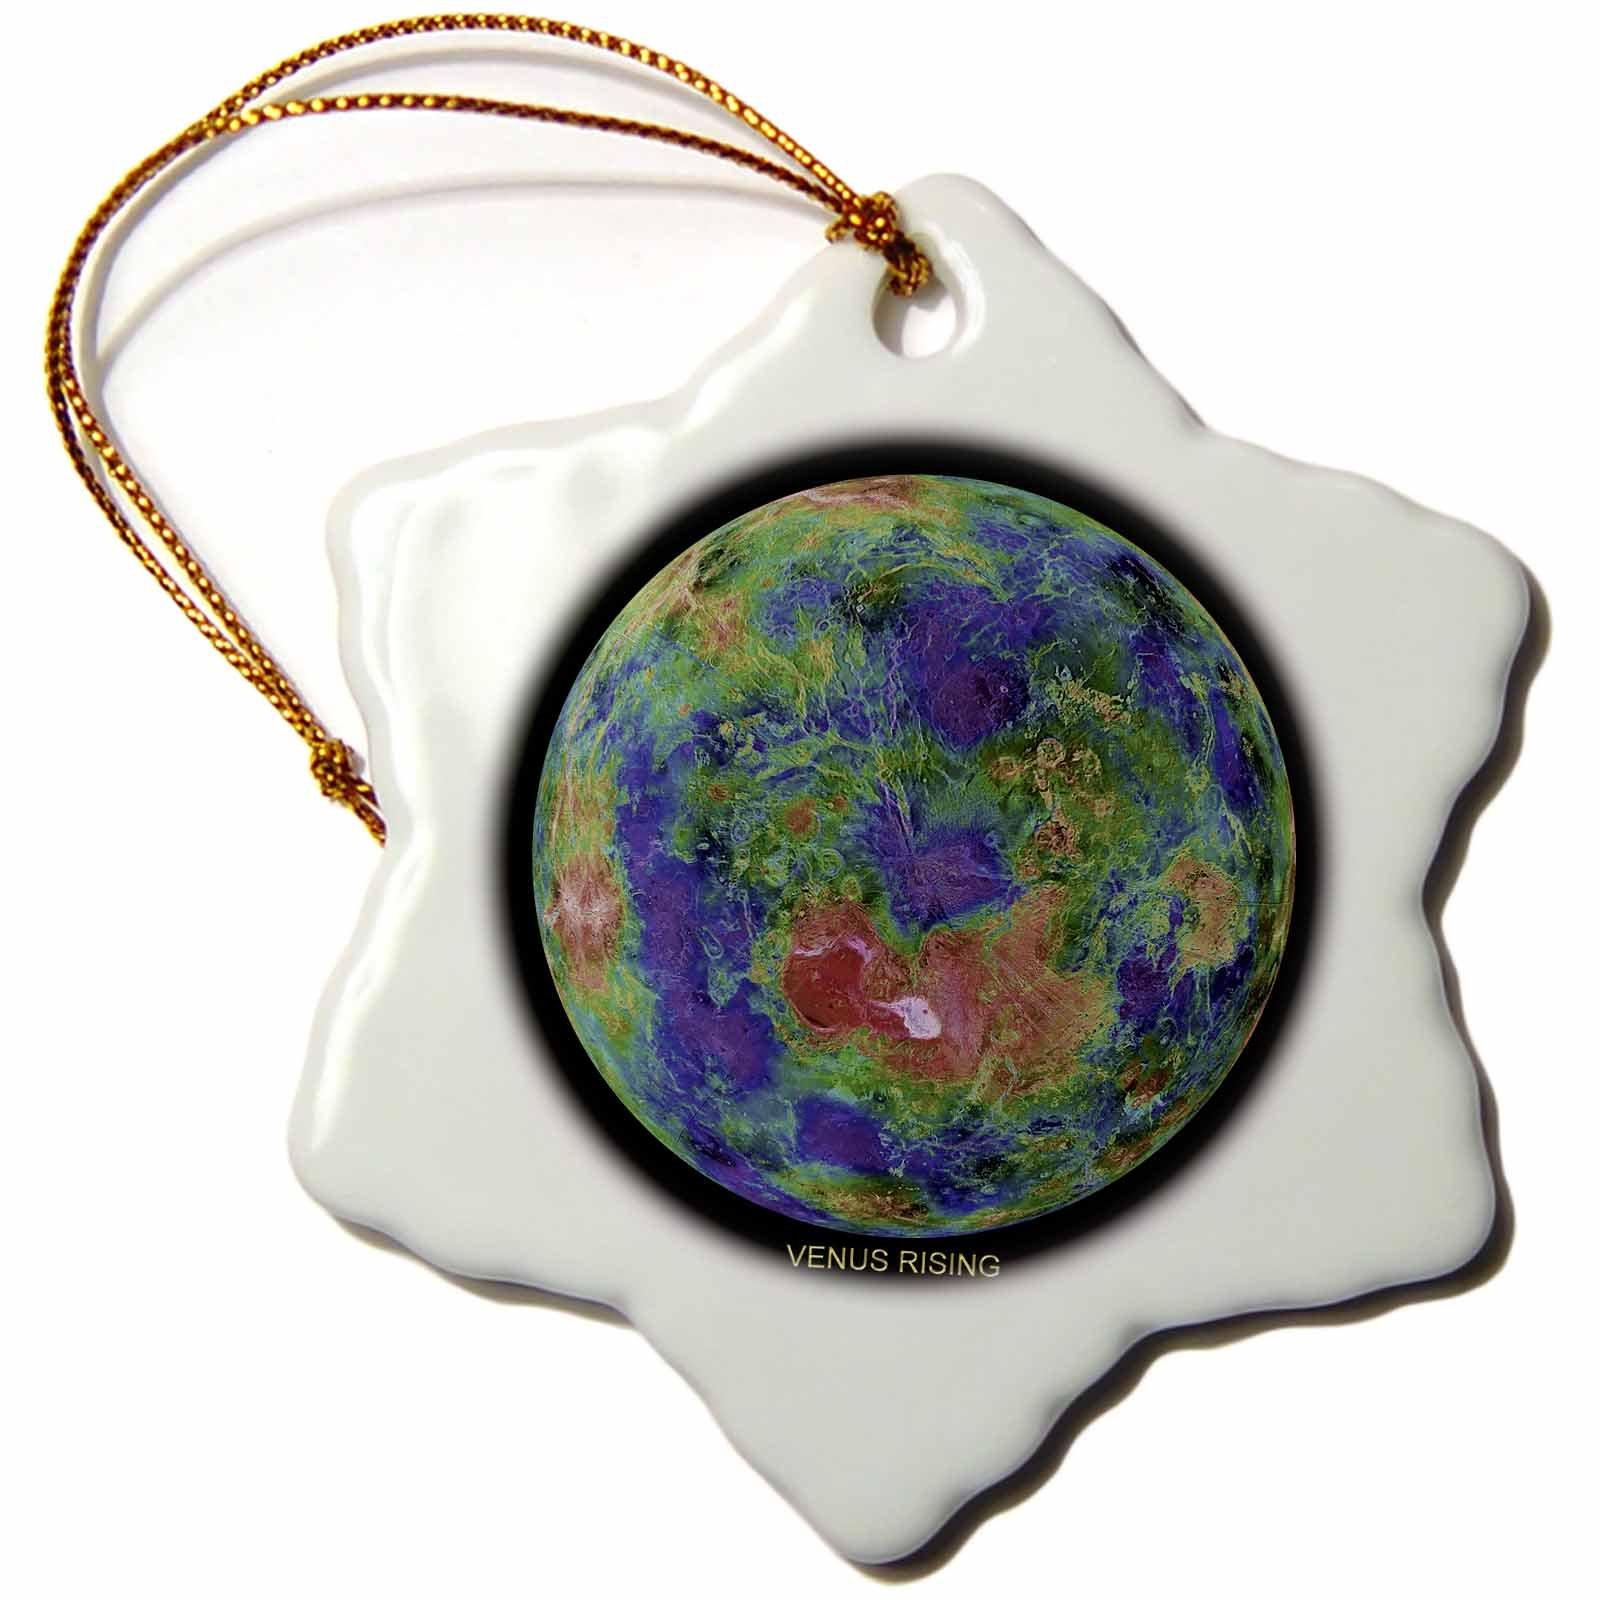 3dRose orn_76853_1 Solar System-Venus Rising-Snowflake Ornament, 3-Inch, Porcelain